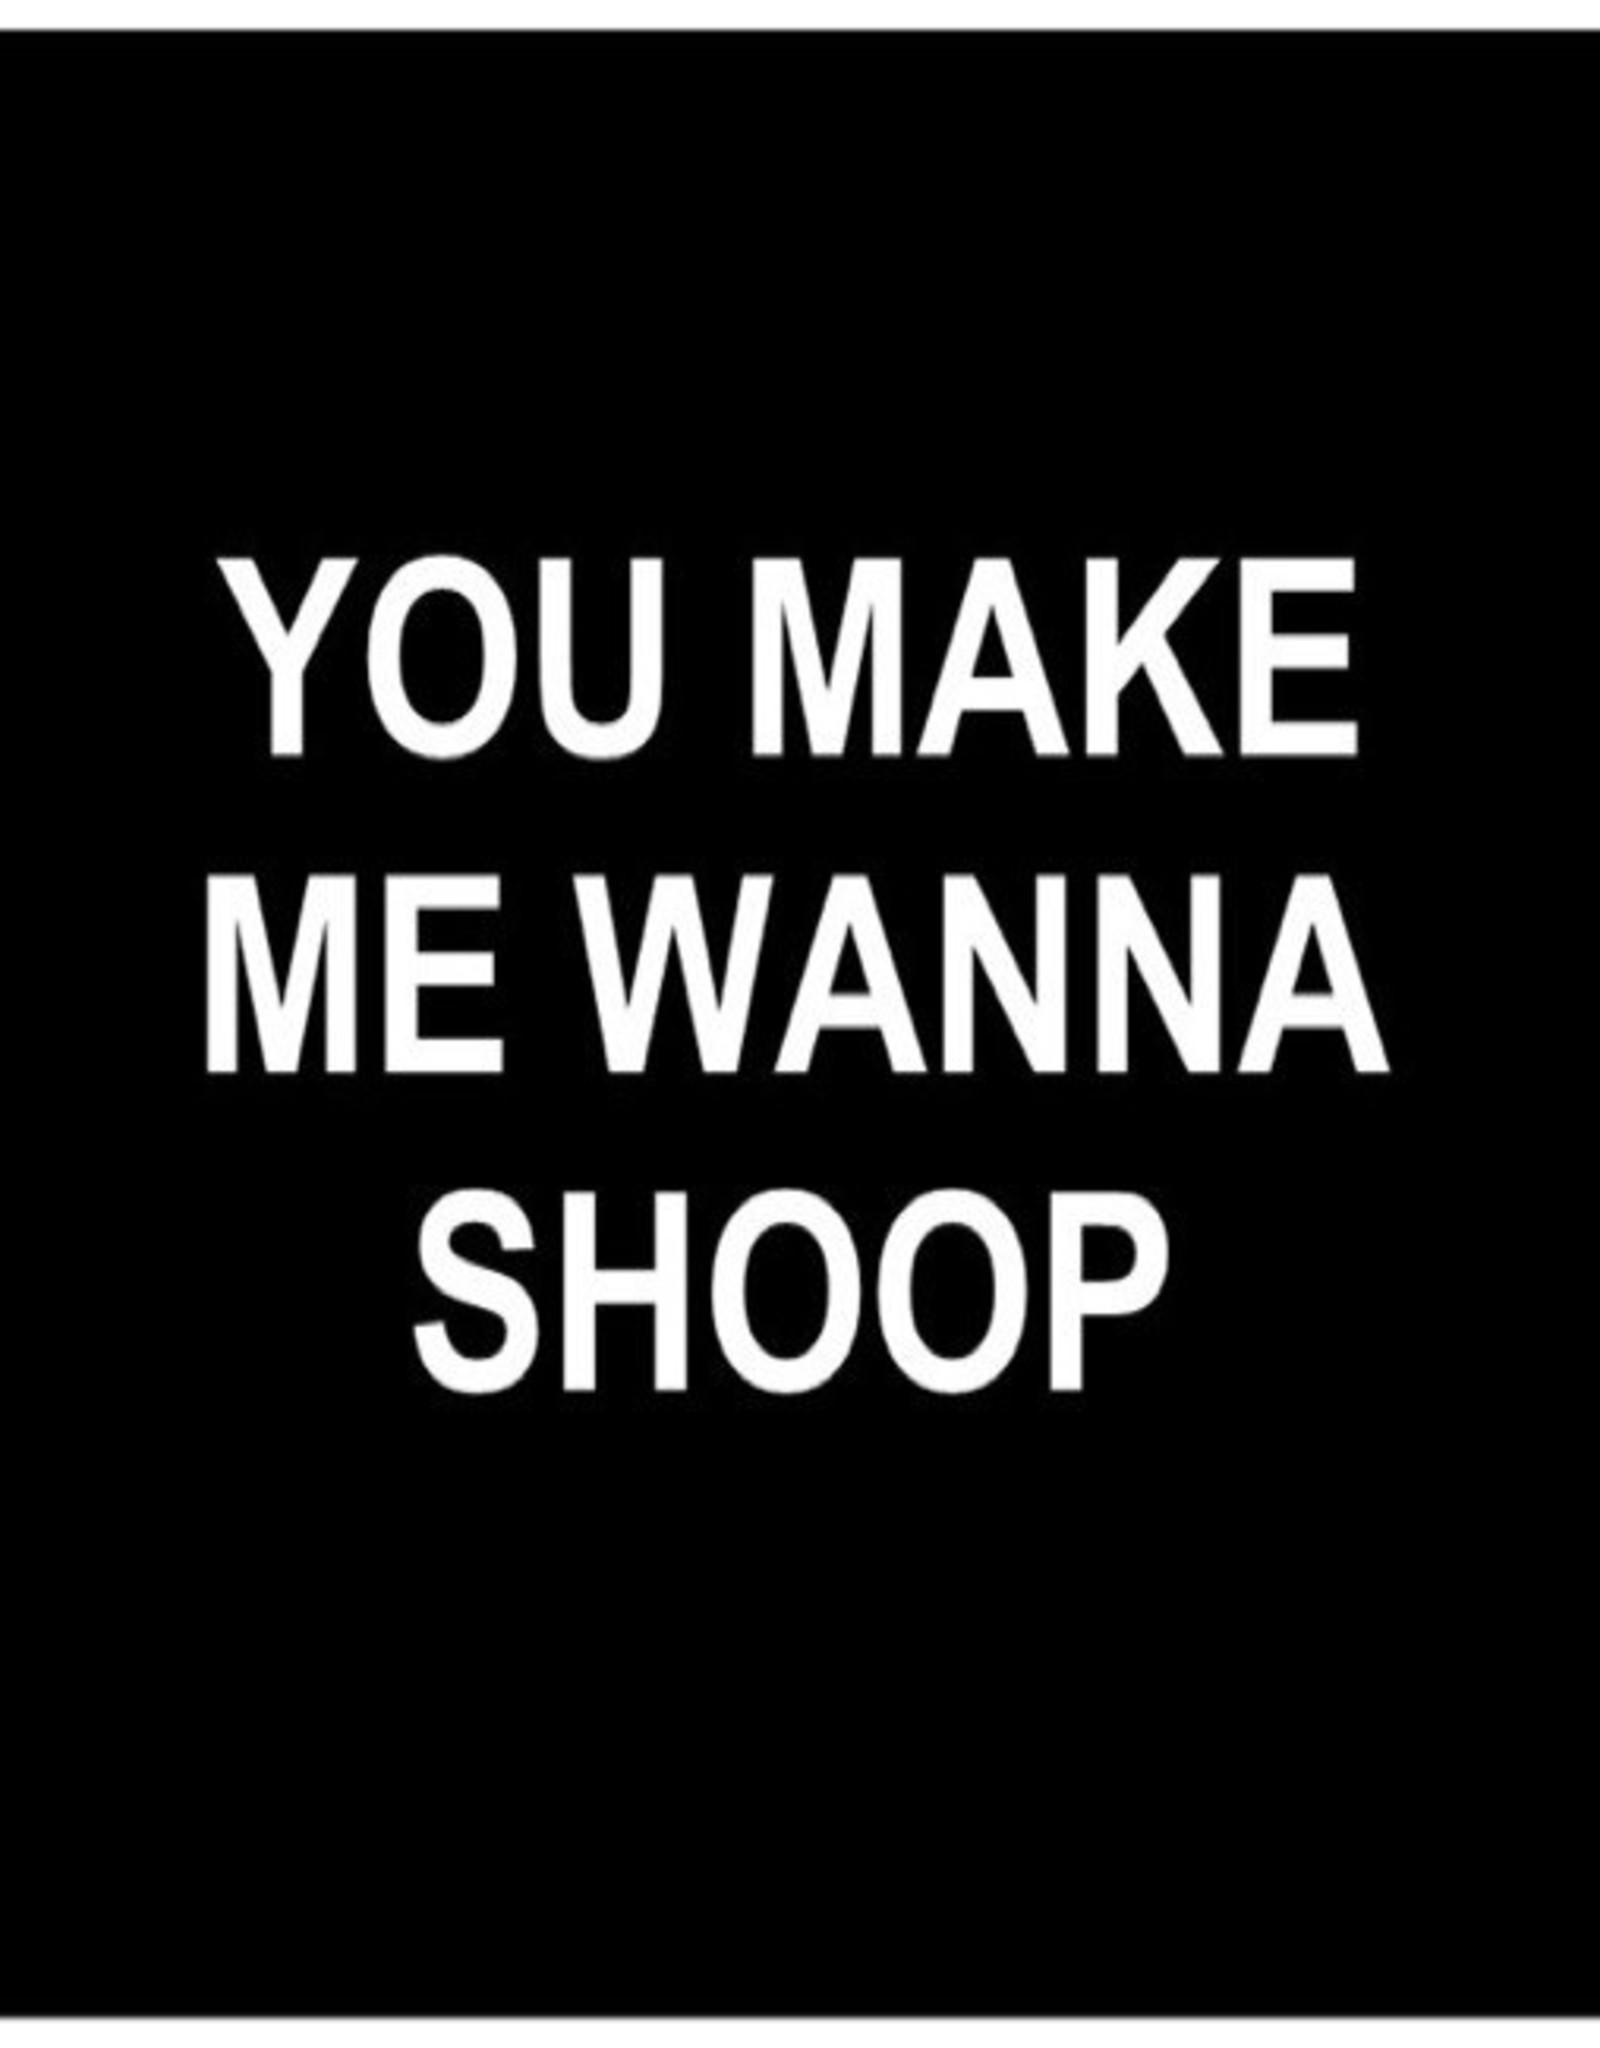 Card #128 - You Make Me Wanna Shoop